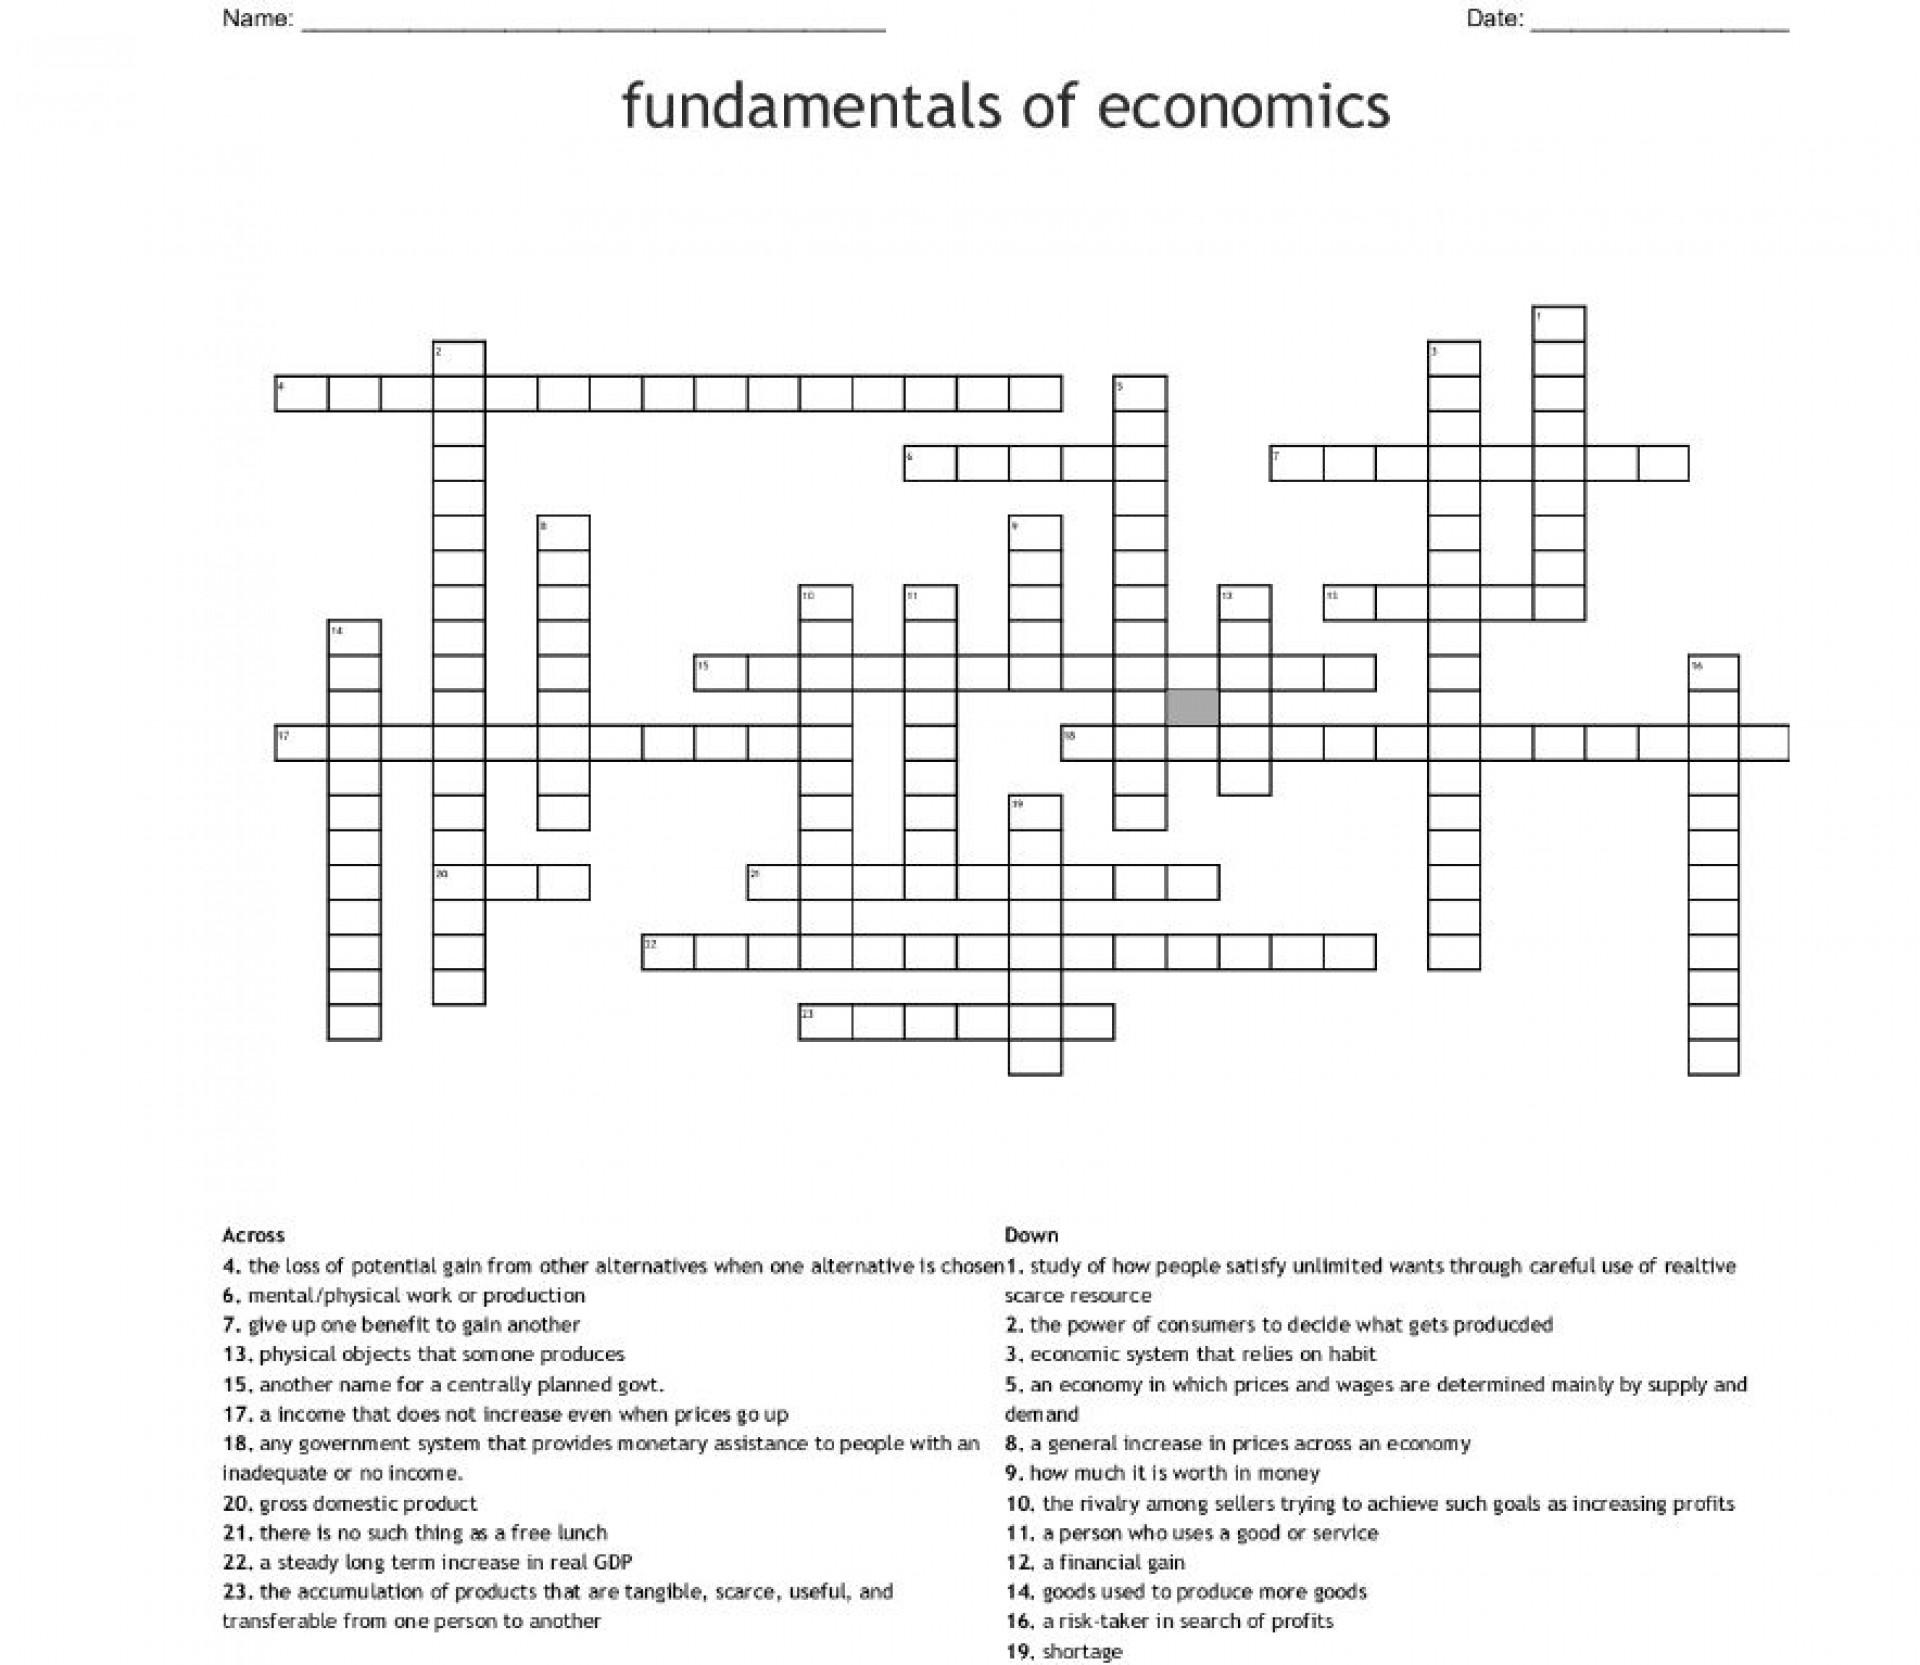 001 Imposing Prosperity Crossword Picture  Clue 6 Letter Material Prosperou 41920